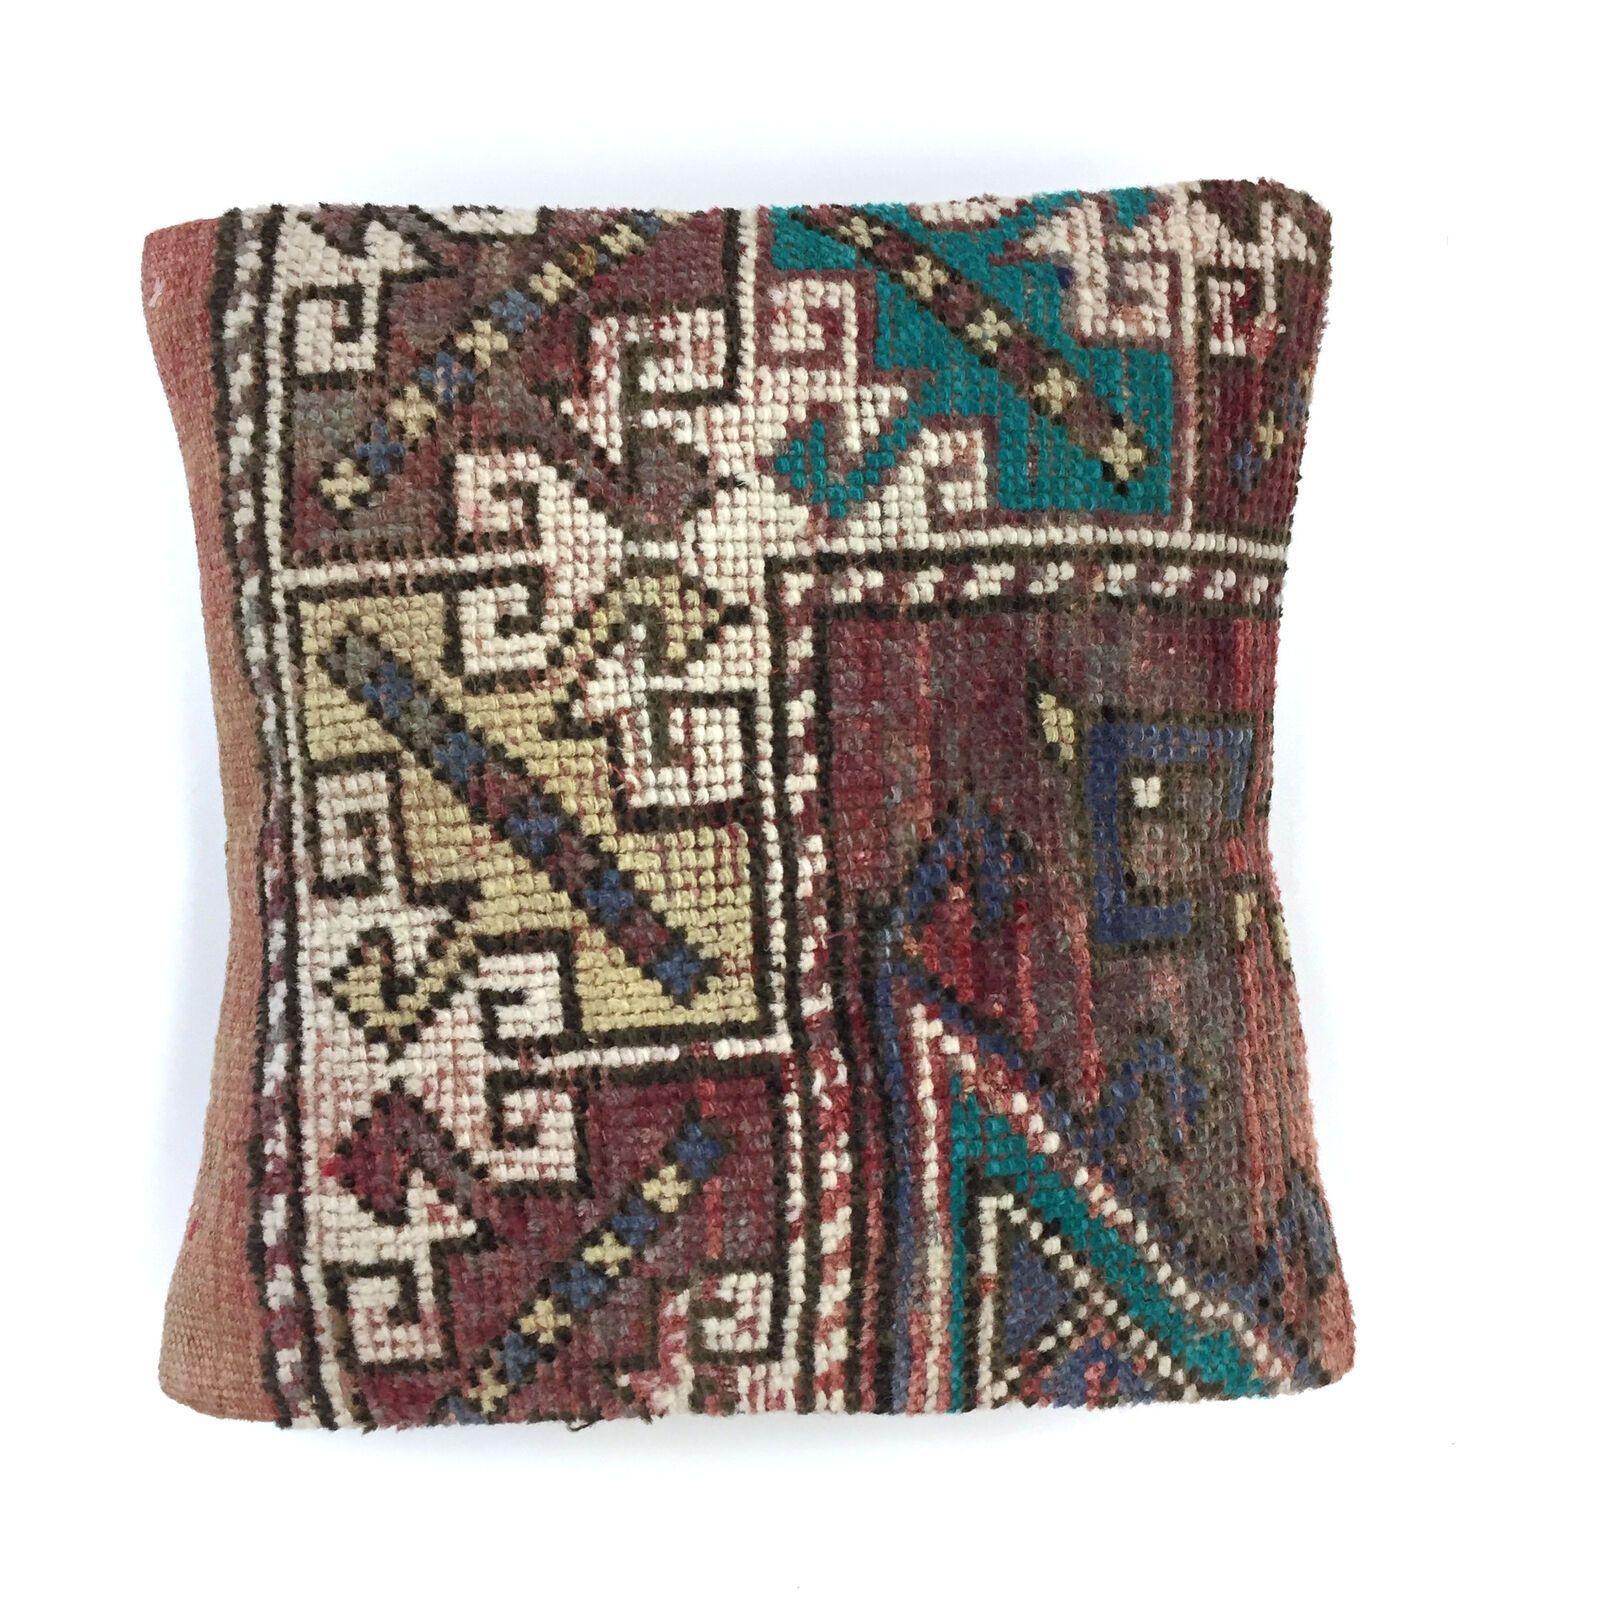 40x40 cm Kilim Cushions, Kelim Pillow